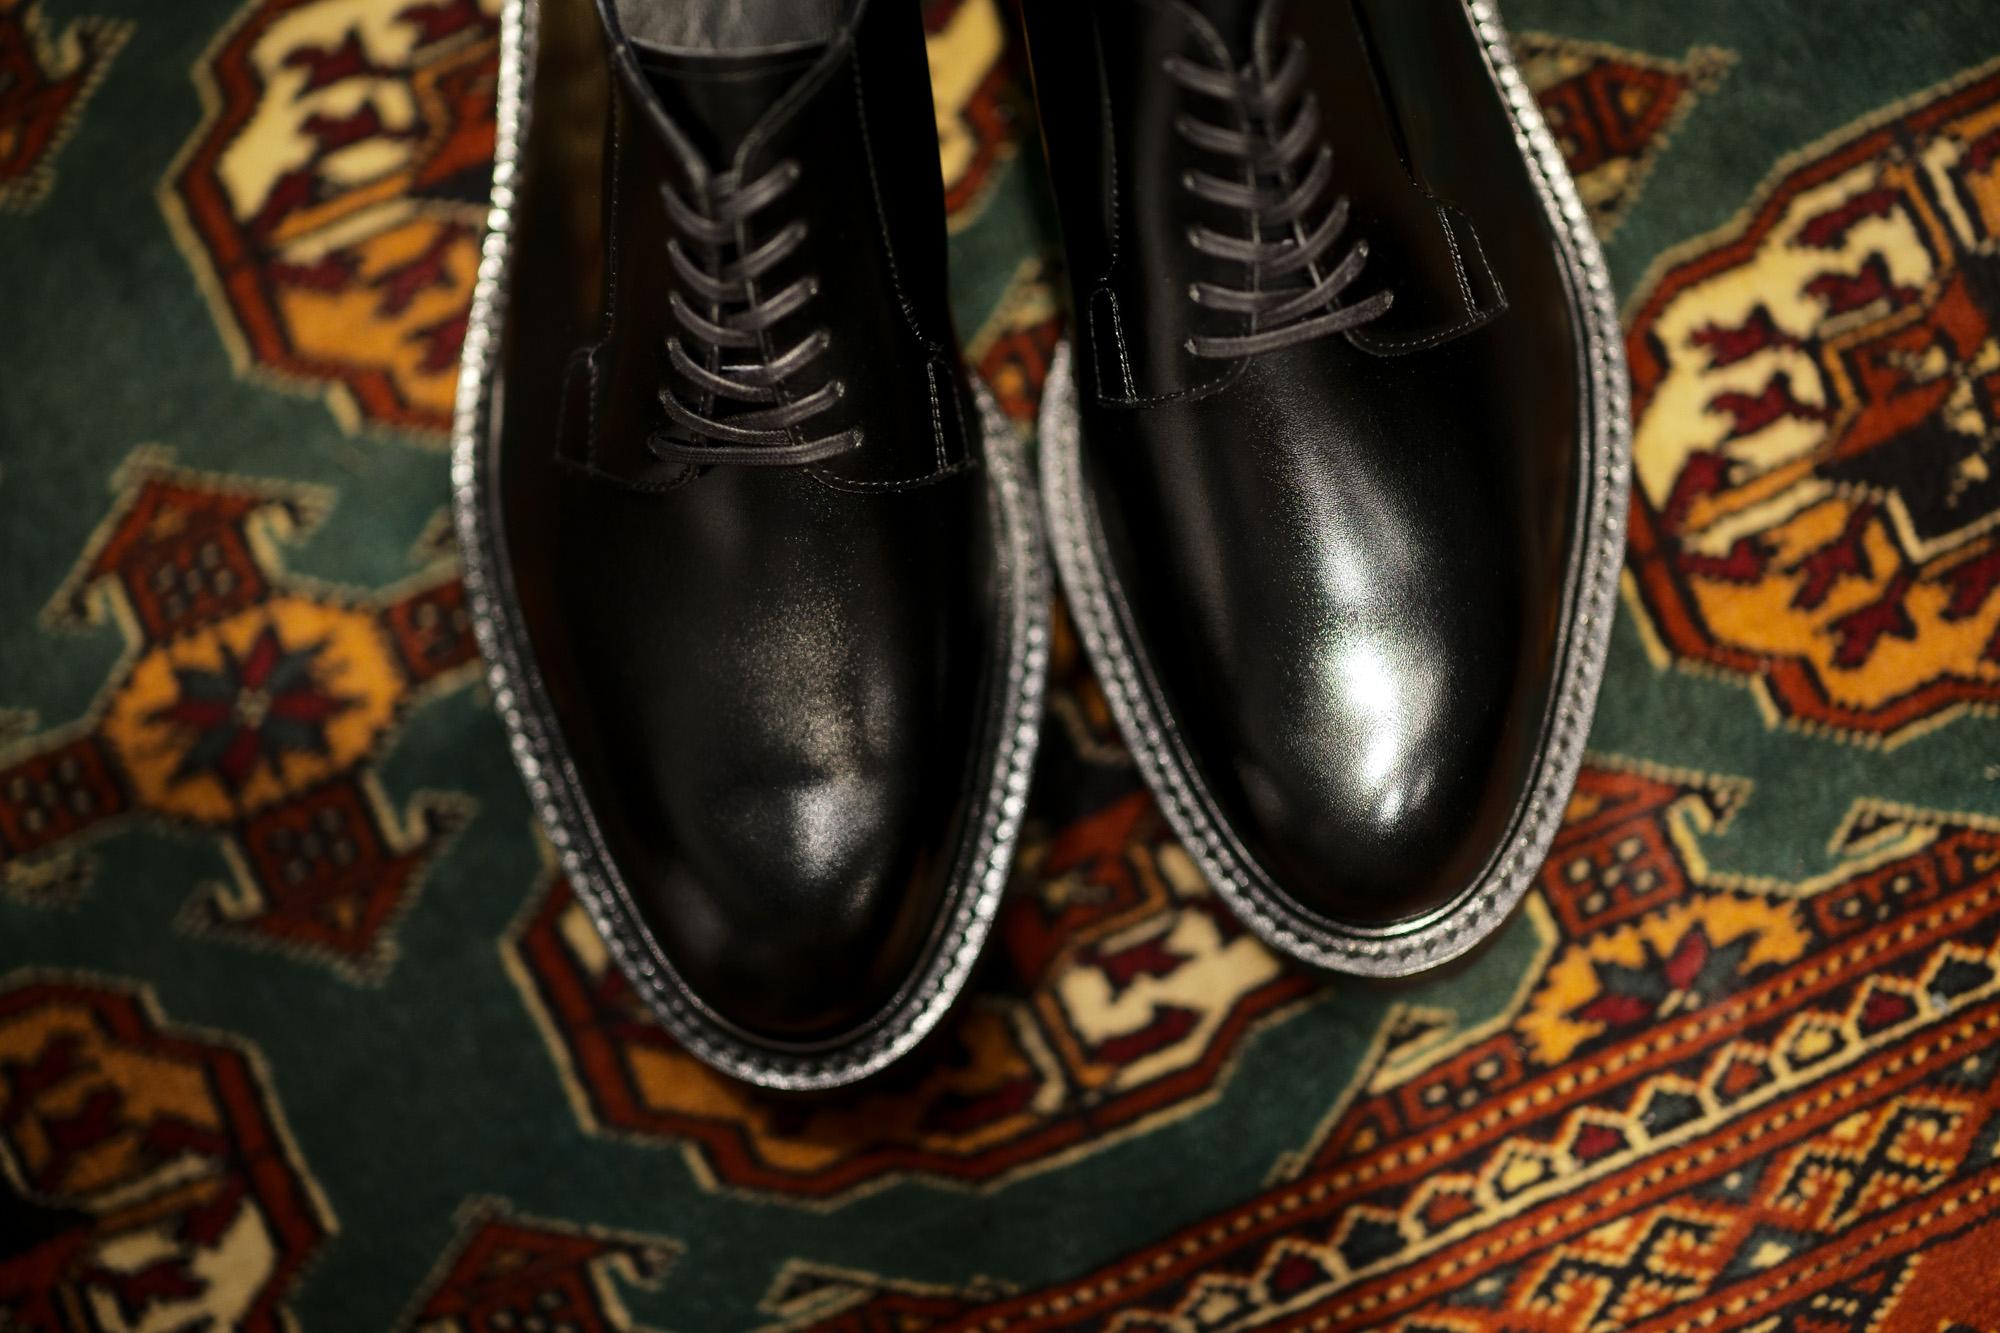 WH (ダブルエイチ) WHS-0001 Plane Toe Shoes (干場氏 スペシャル モデル) Cruise Last (クルーズラスト) ANNONAY Vocalou Calf Leather プレーントゥシューズ BLACK (ブラック) MADE IN JAPAN(日本製) 2019 春夏新作 wh 干場さん 干場スペシャル FORZASTYLE フォルザスタイル 愛知 名古屋 Alto e Diritto アルト エ デリット